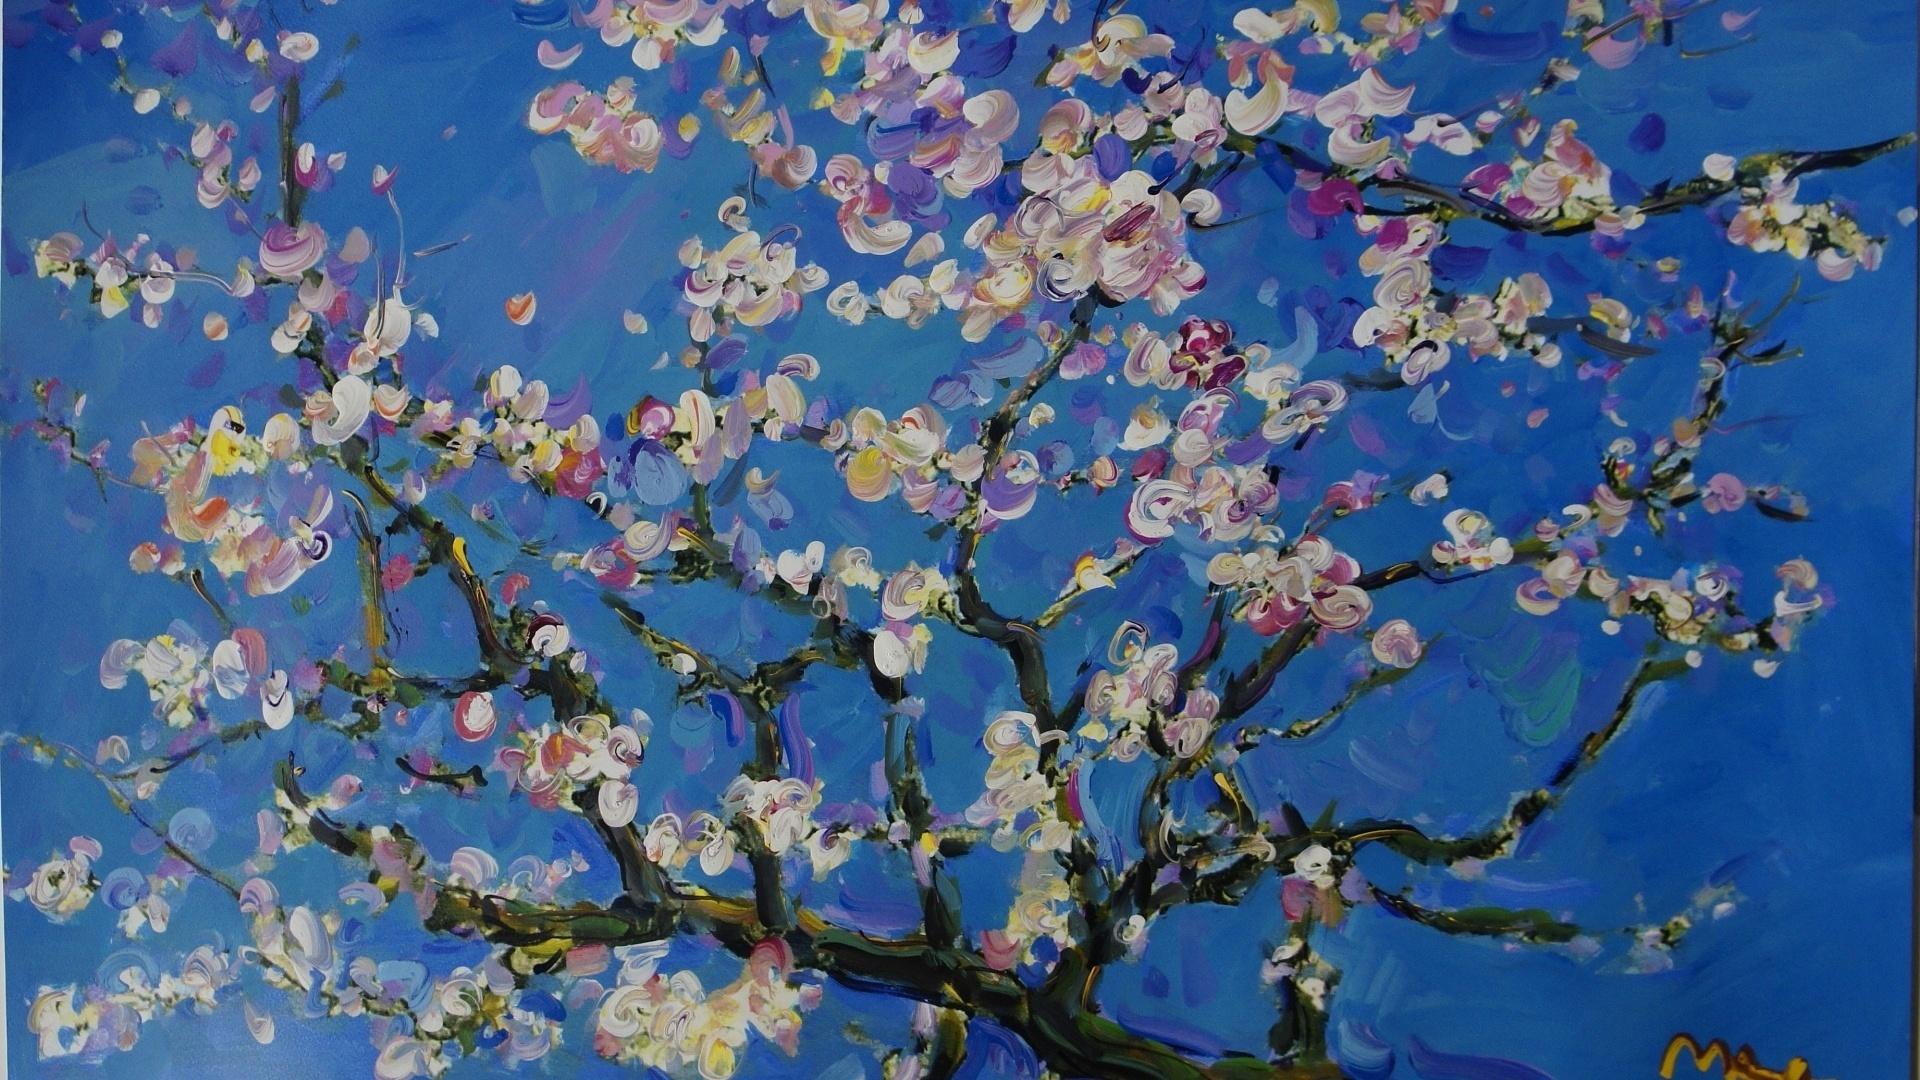 1920x1080 Arts Paintings Vincent Van Gogh Blossom 1920x1080